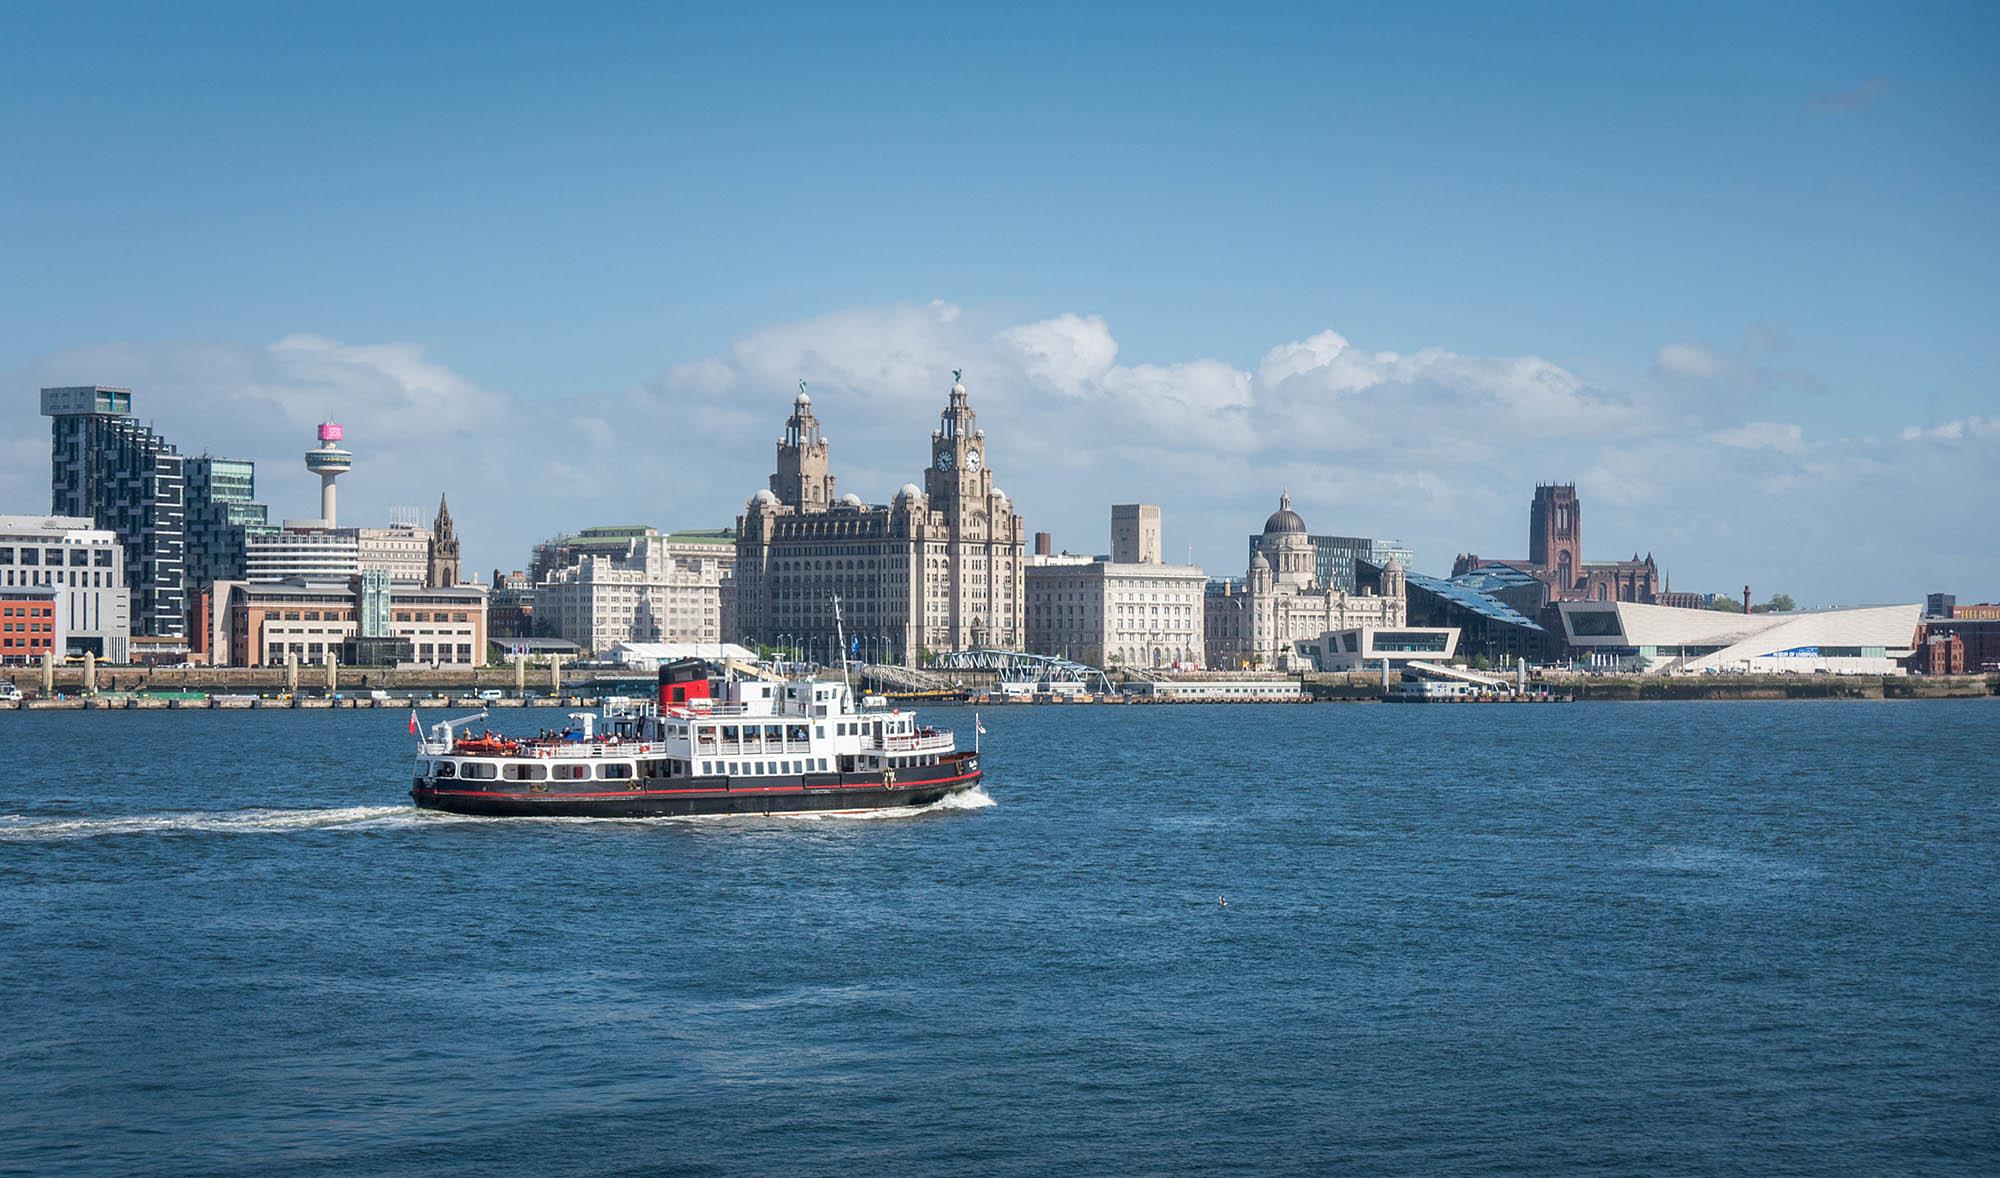 Ferry across the Mersey